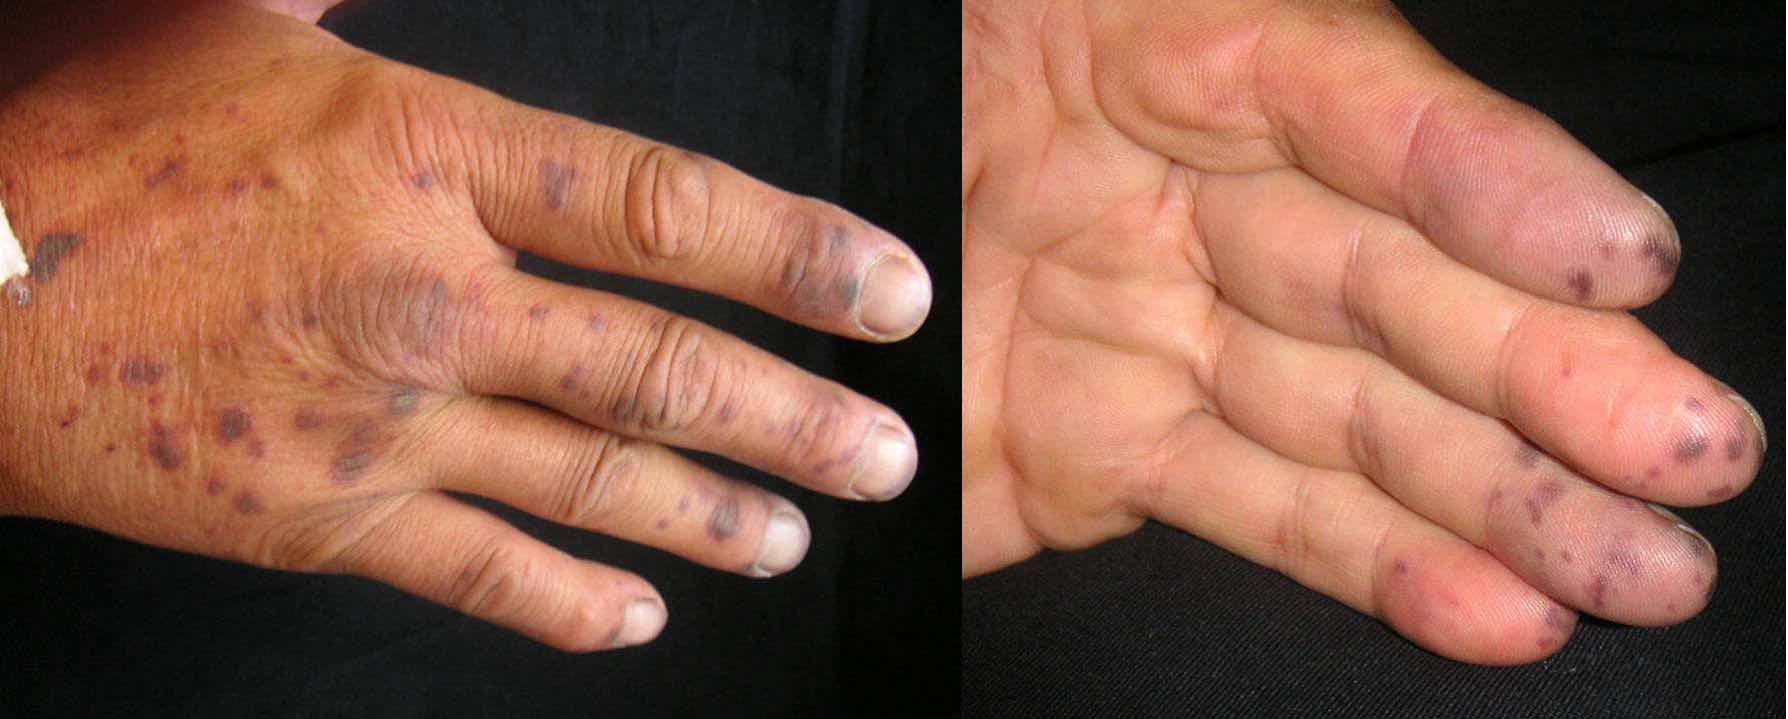 imágenes de diabetes por vasculitis leucocitoclástica